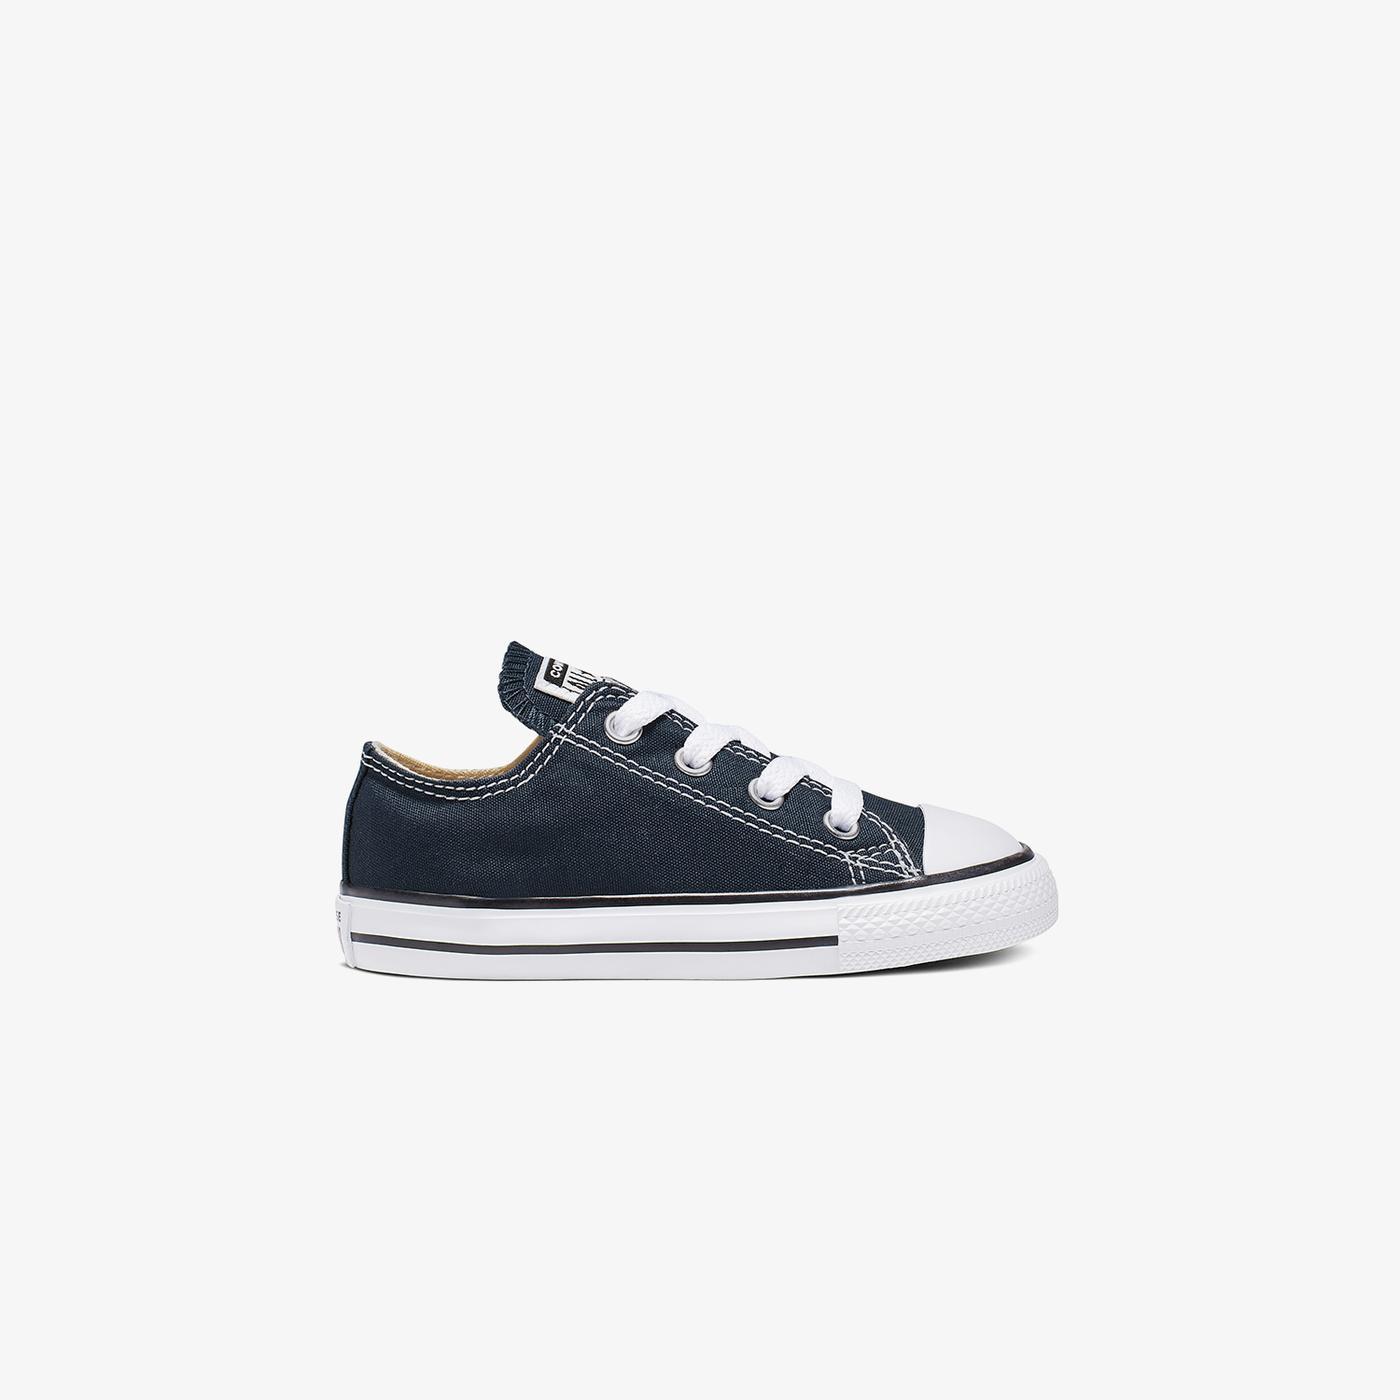 Converse Chuck Taylor All Star Bebek Mavi Sneaker